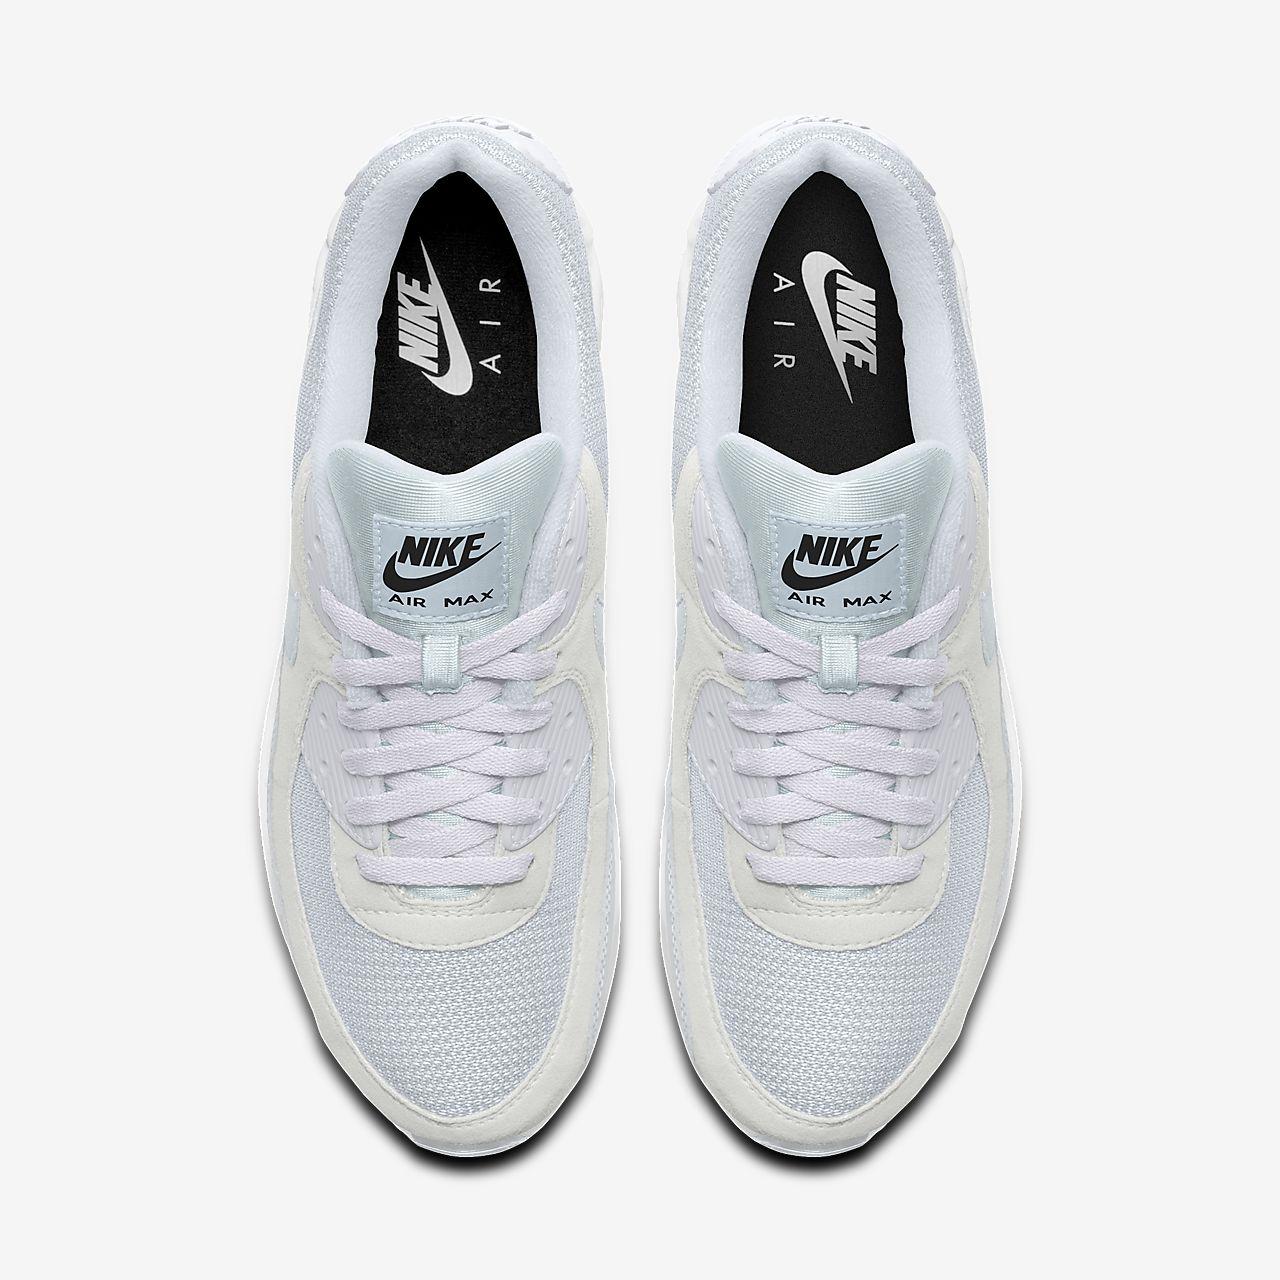 Scarpa personalizzabile Nike Air Max 90 By You Uomo